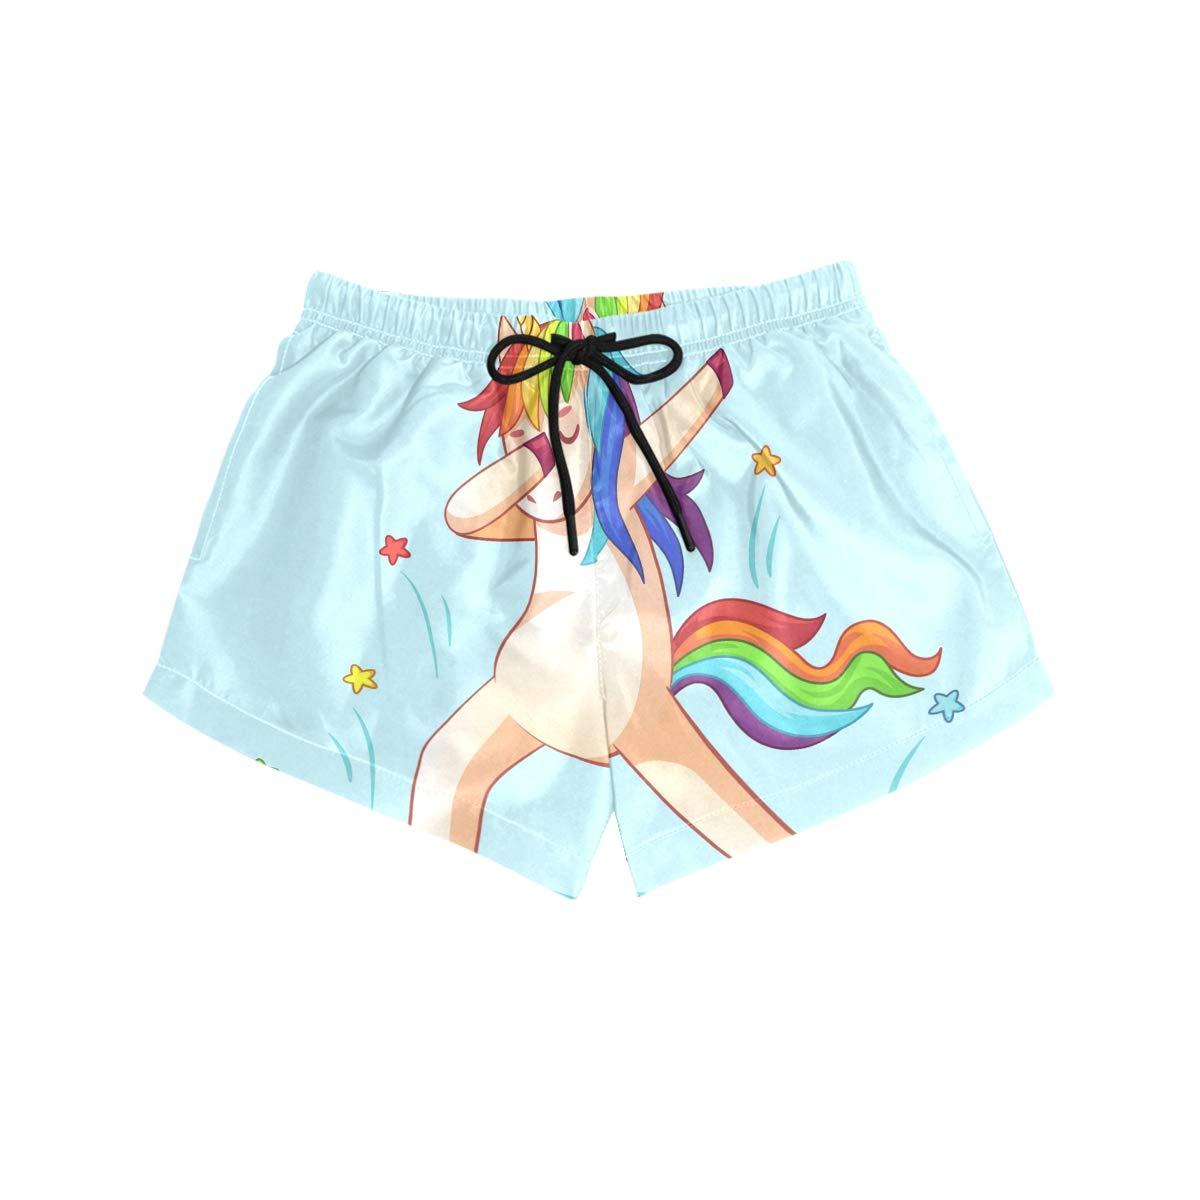 FORMRS Womens Swim Dabbing Unicorn Board Shorts Bottom Beach Short Trunk Swimwear with Drawstring